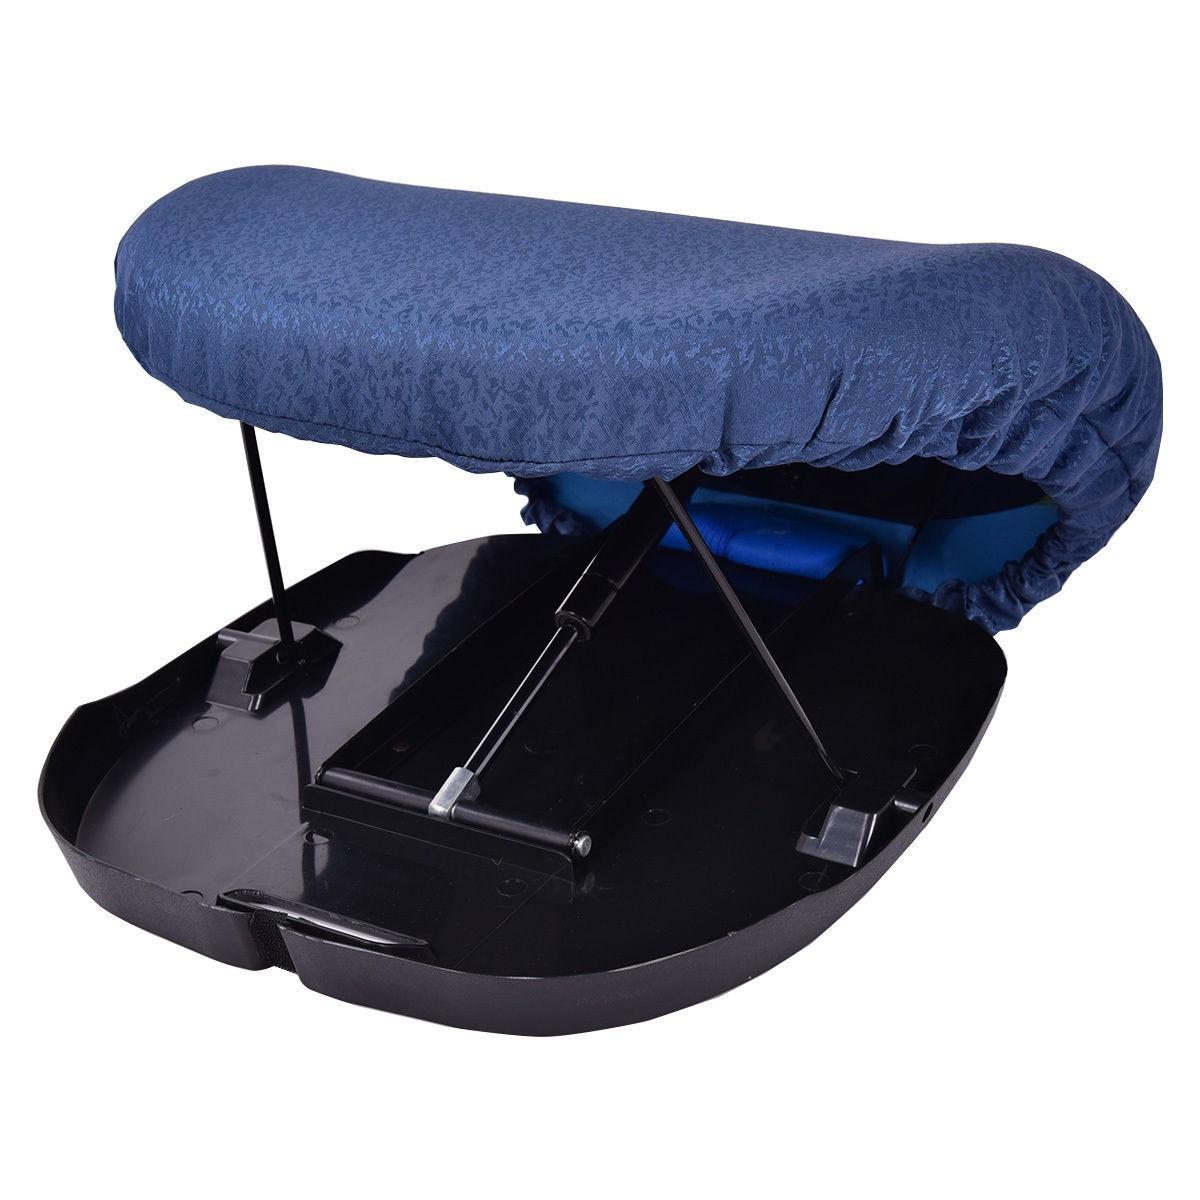 Us Adjustable Lifting Cushion Seat Easy Chair Sofa